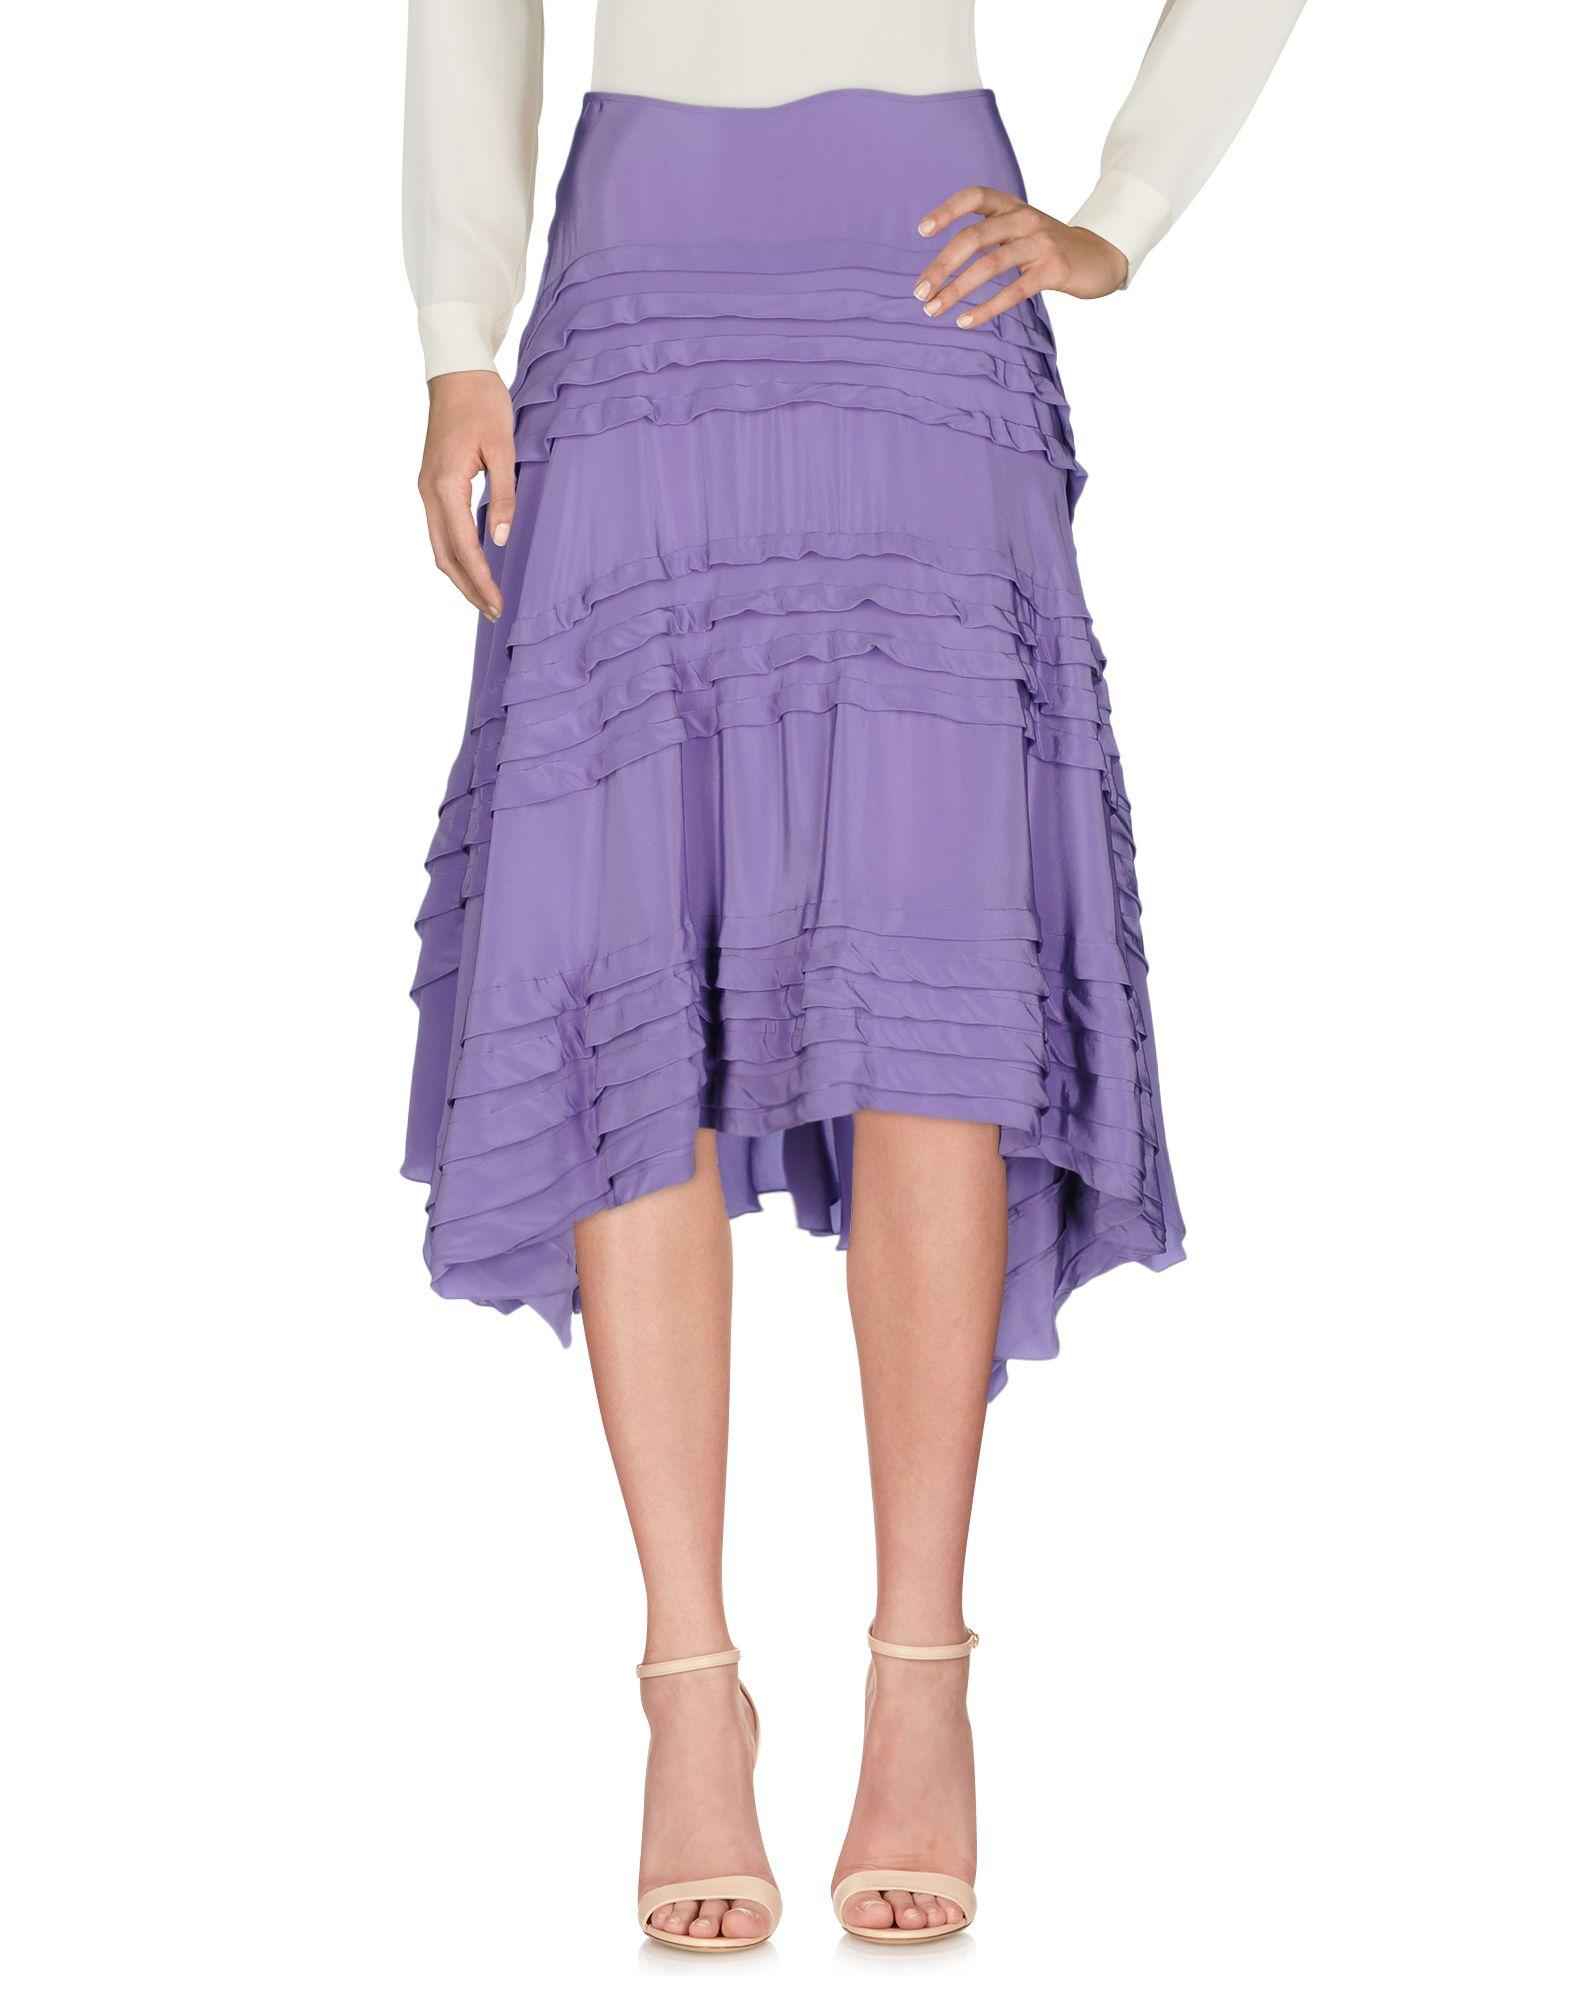 DKNY Damen Midirock Farbe Lila Größe 3 jetztbilligerkaufen